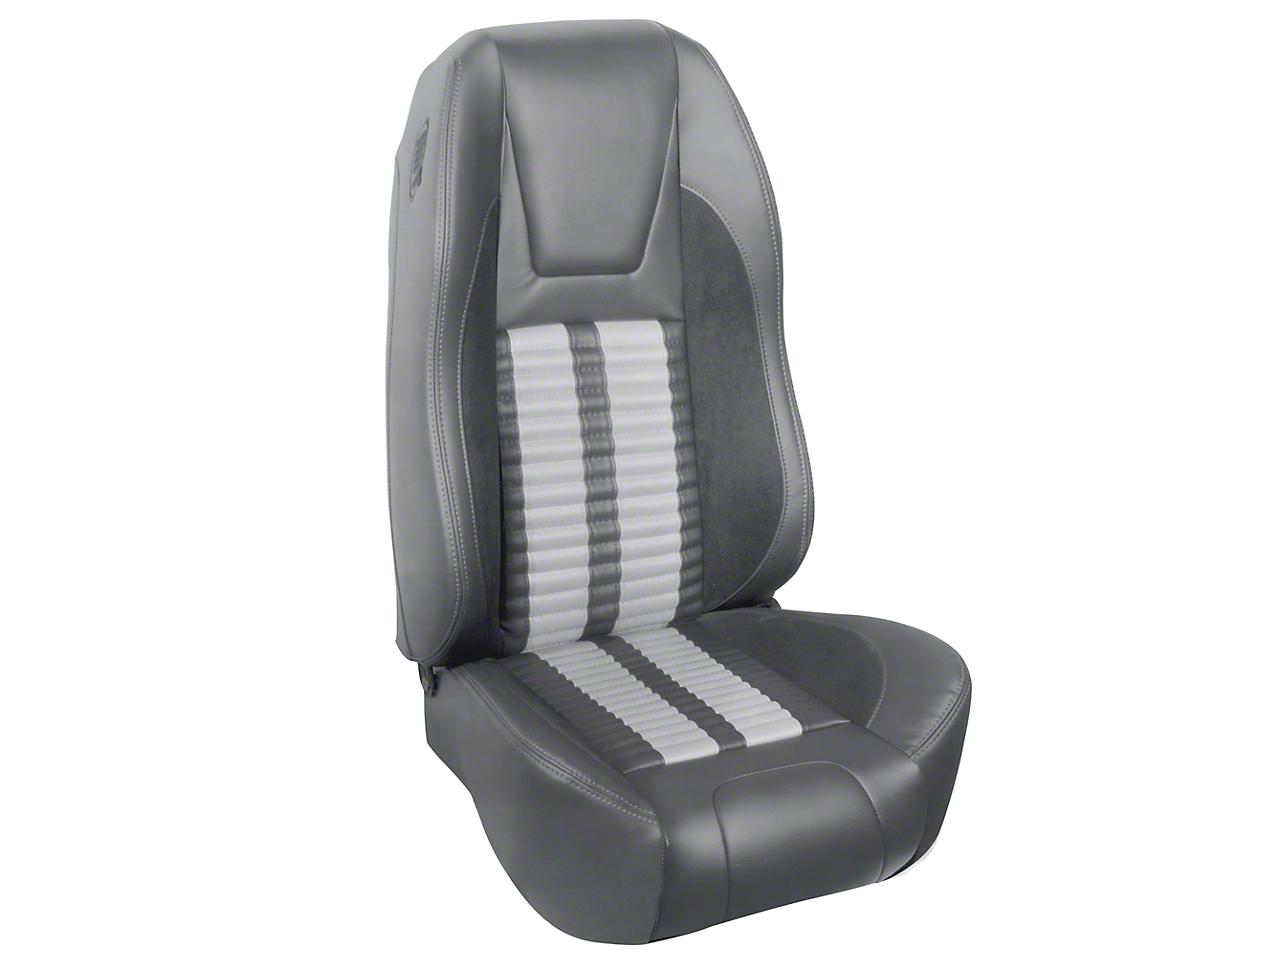 TMI Premium Sport R500 Upholstery & Foam Kit - Gray Vinyl & White Stripe/Stitch (94-98 All)